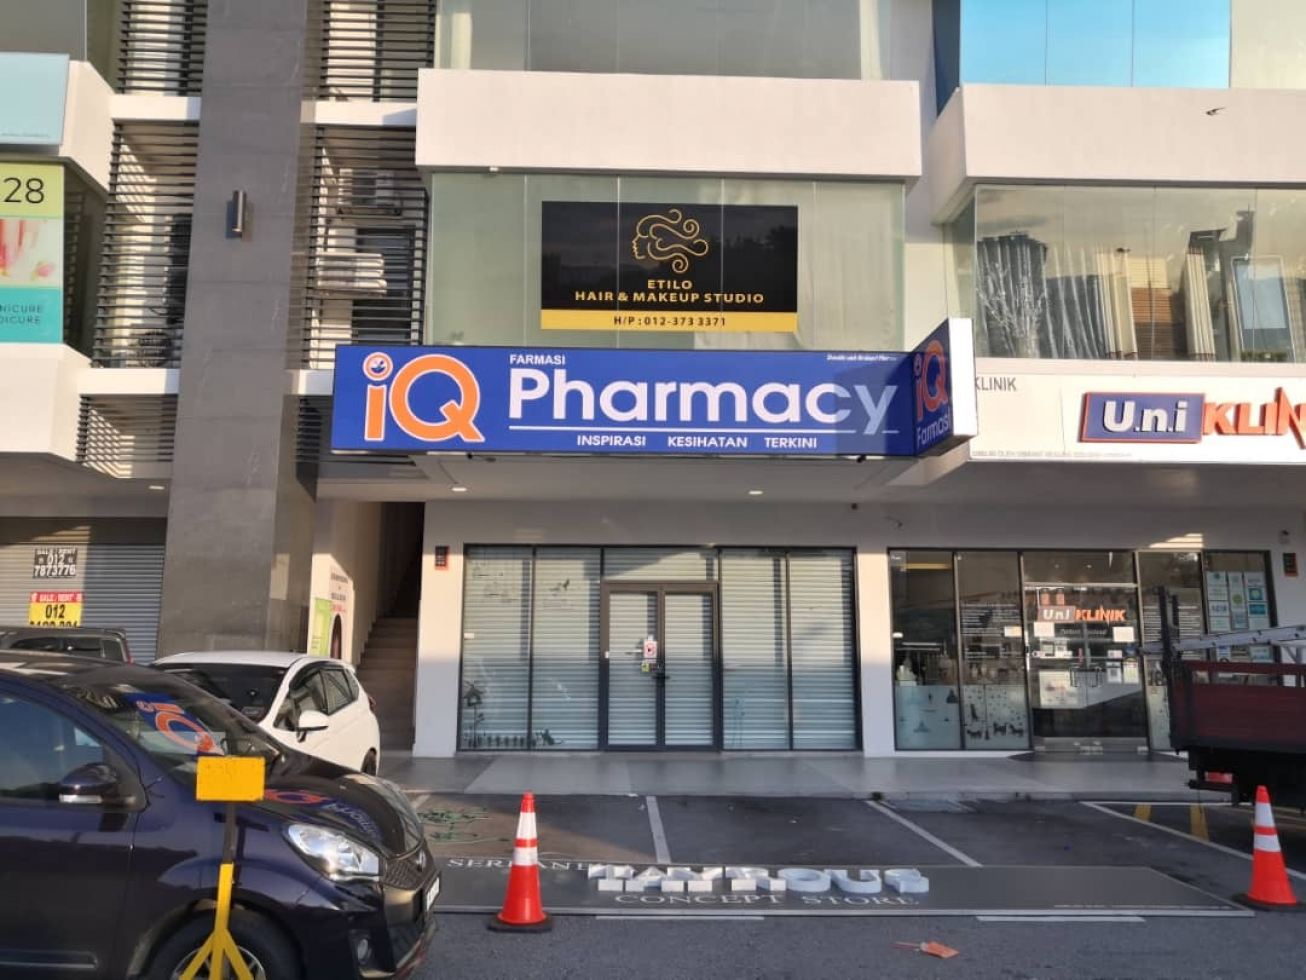 Led Lightboard (iQ Pharmacy)